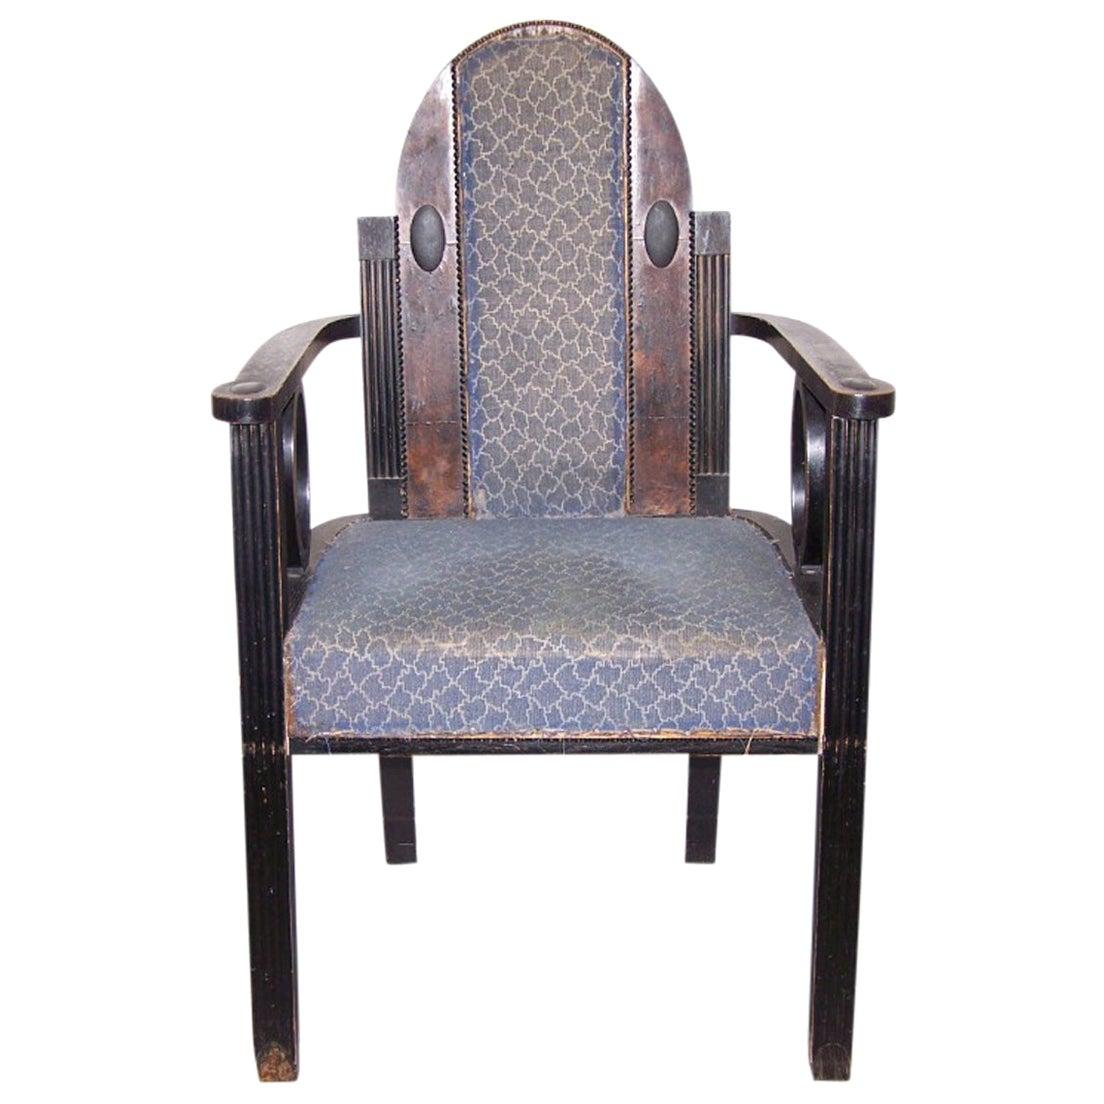 Viennese Chair 1905 Jugendstil, Secession Style 1905 / Original